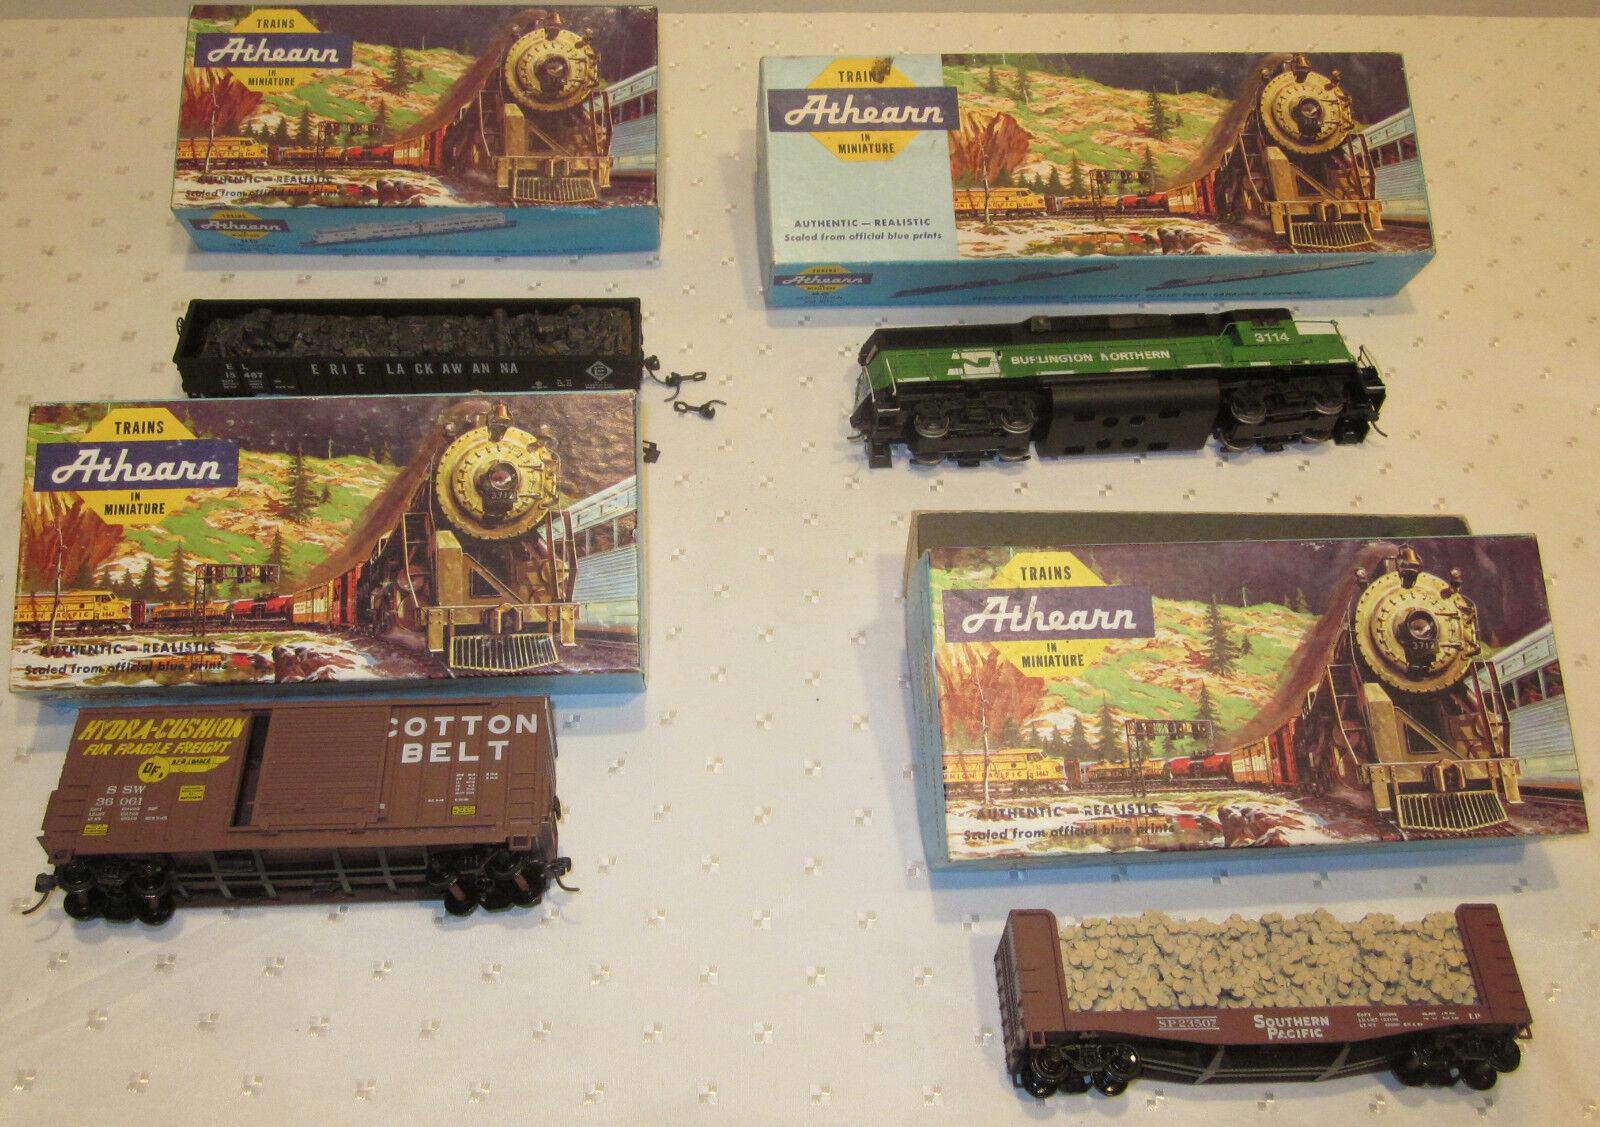 LOT 4 ATHEARN TRAINS IN MINIATURE HO BURLINGTON NORTHERN LOCOMOTIVE + 3 CARS